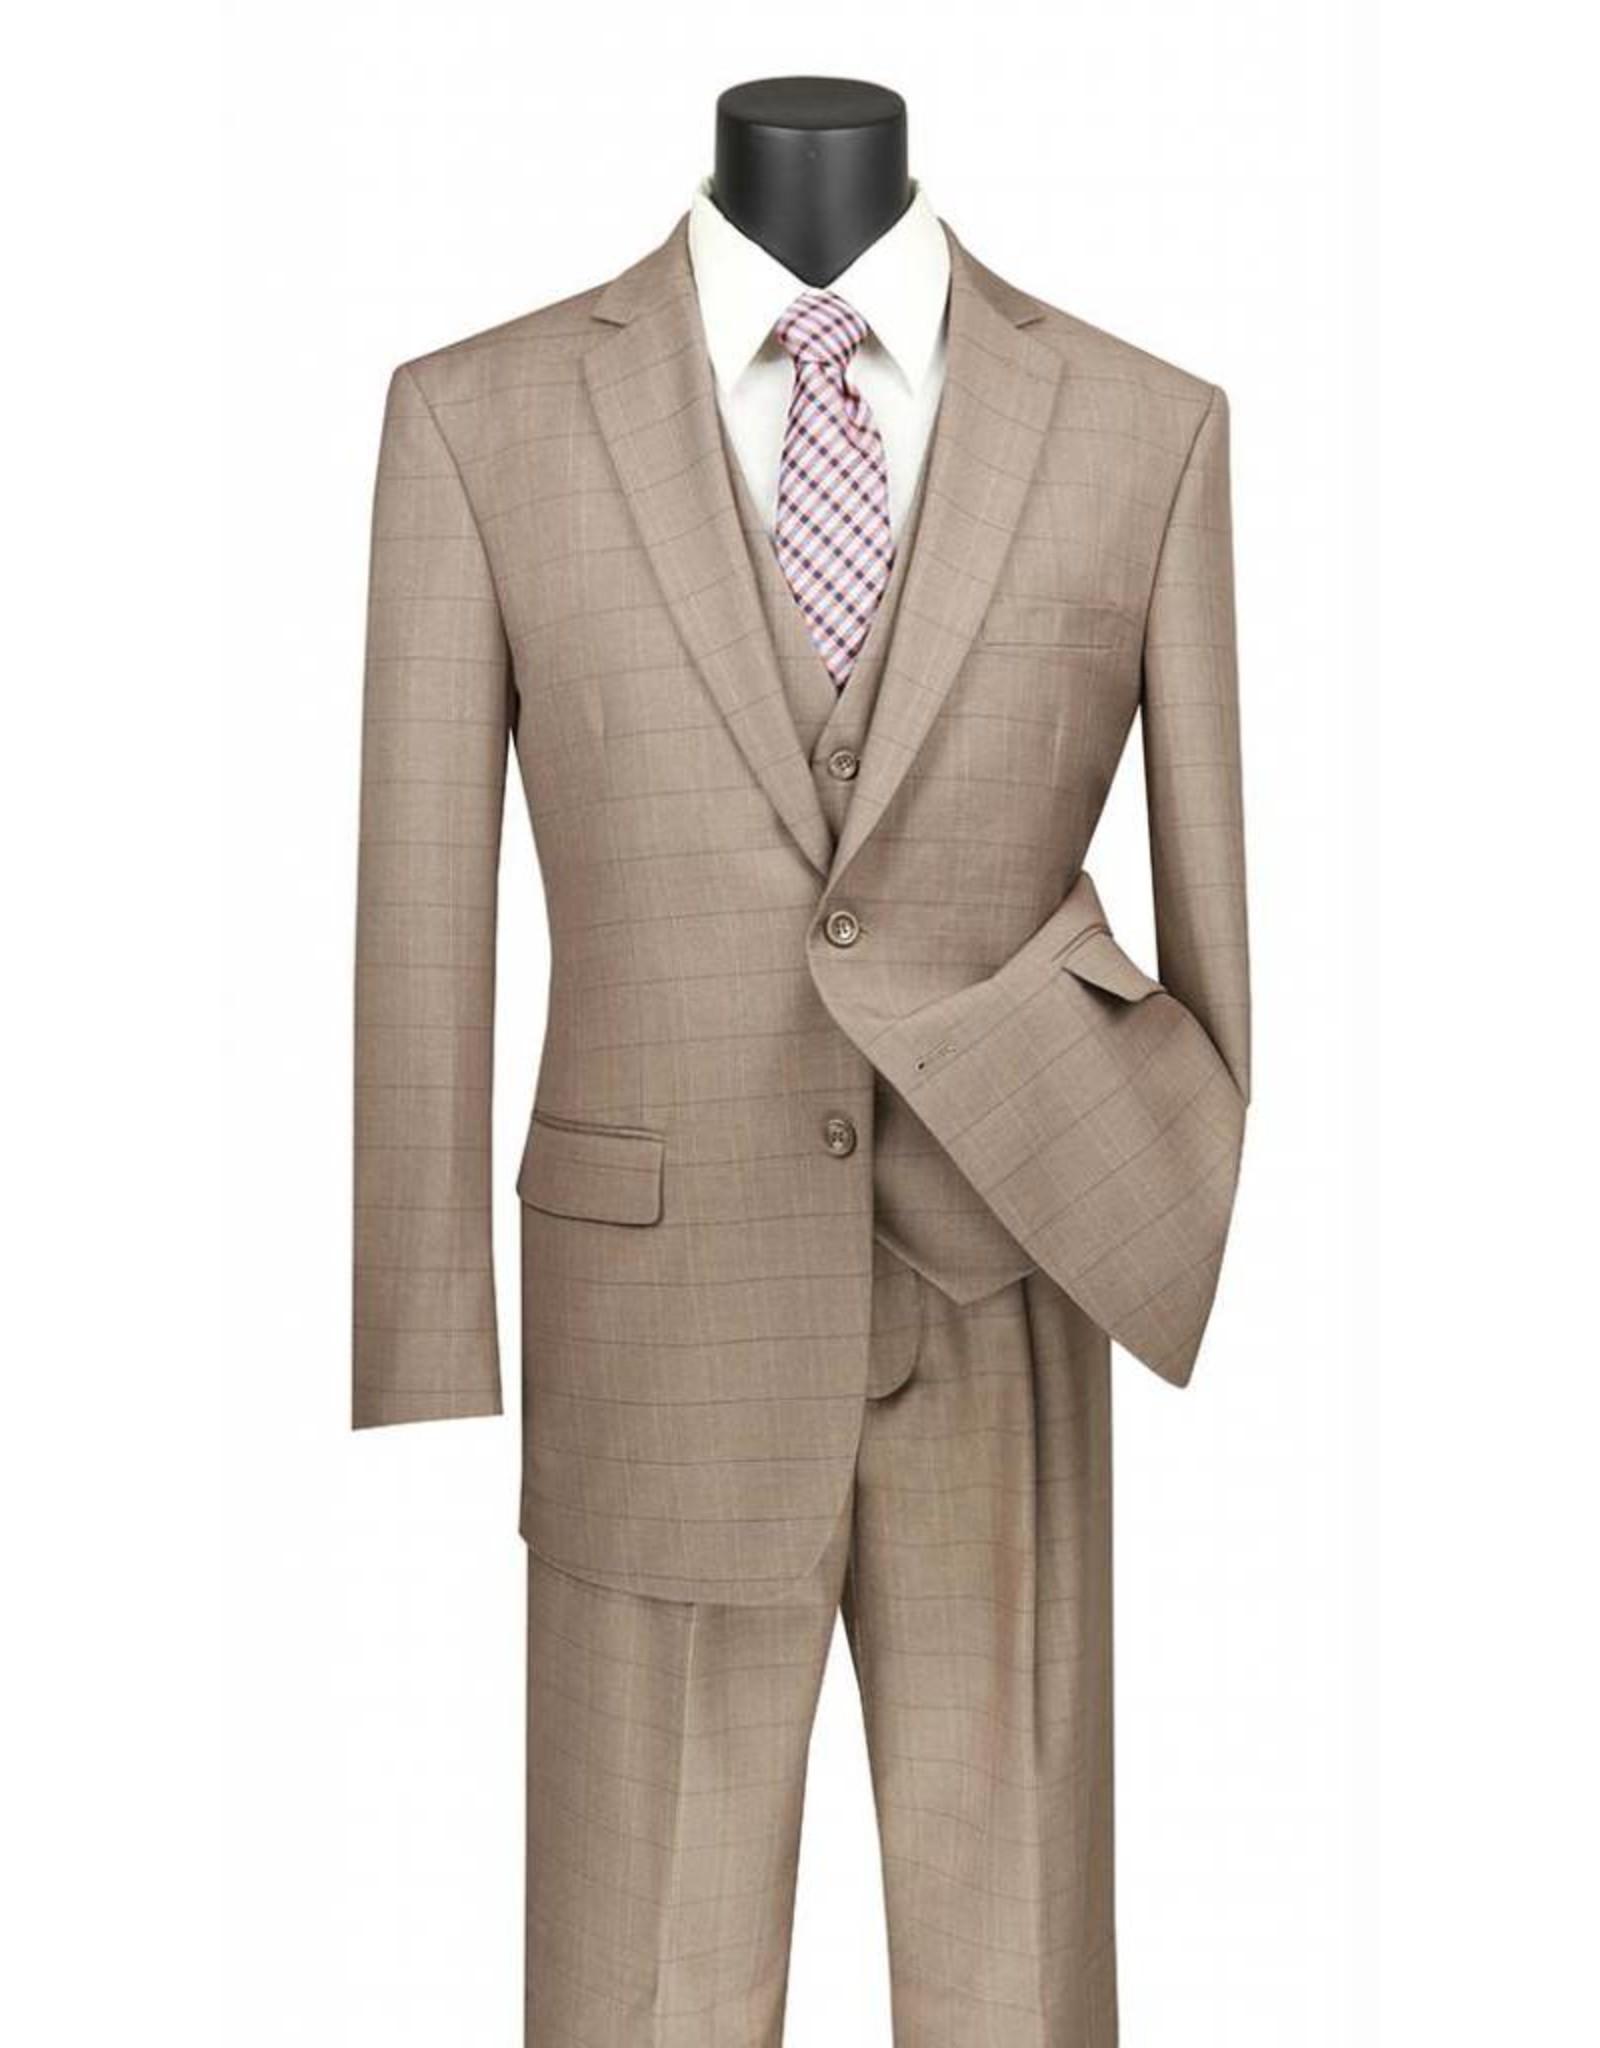 Vinci Vinci Vested Suit - V2RW15 Tan